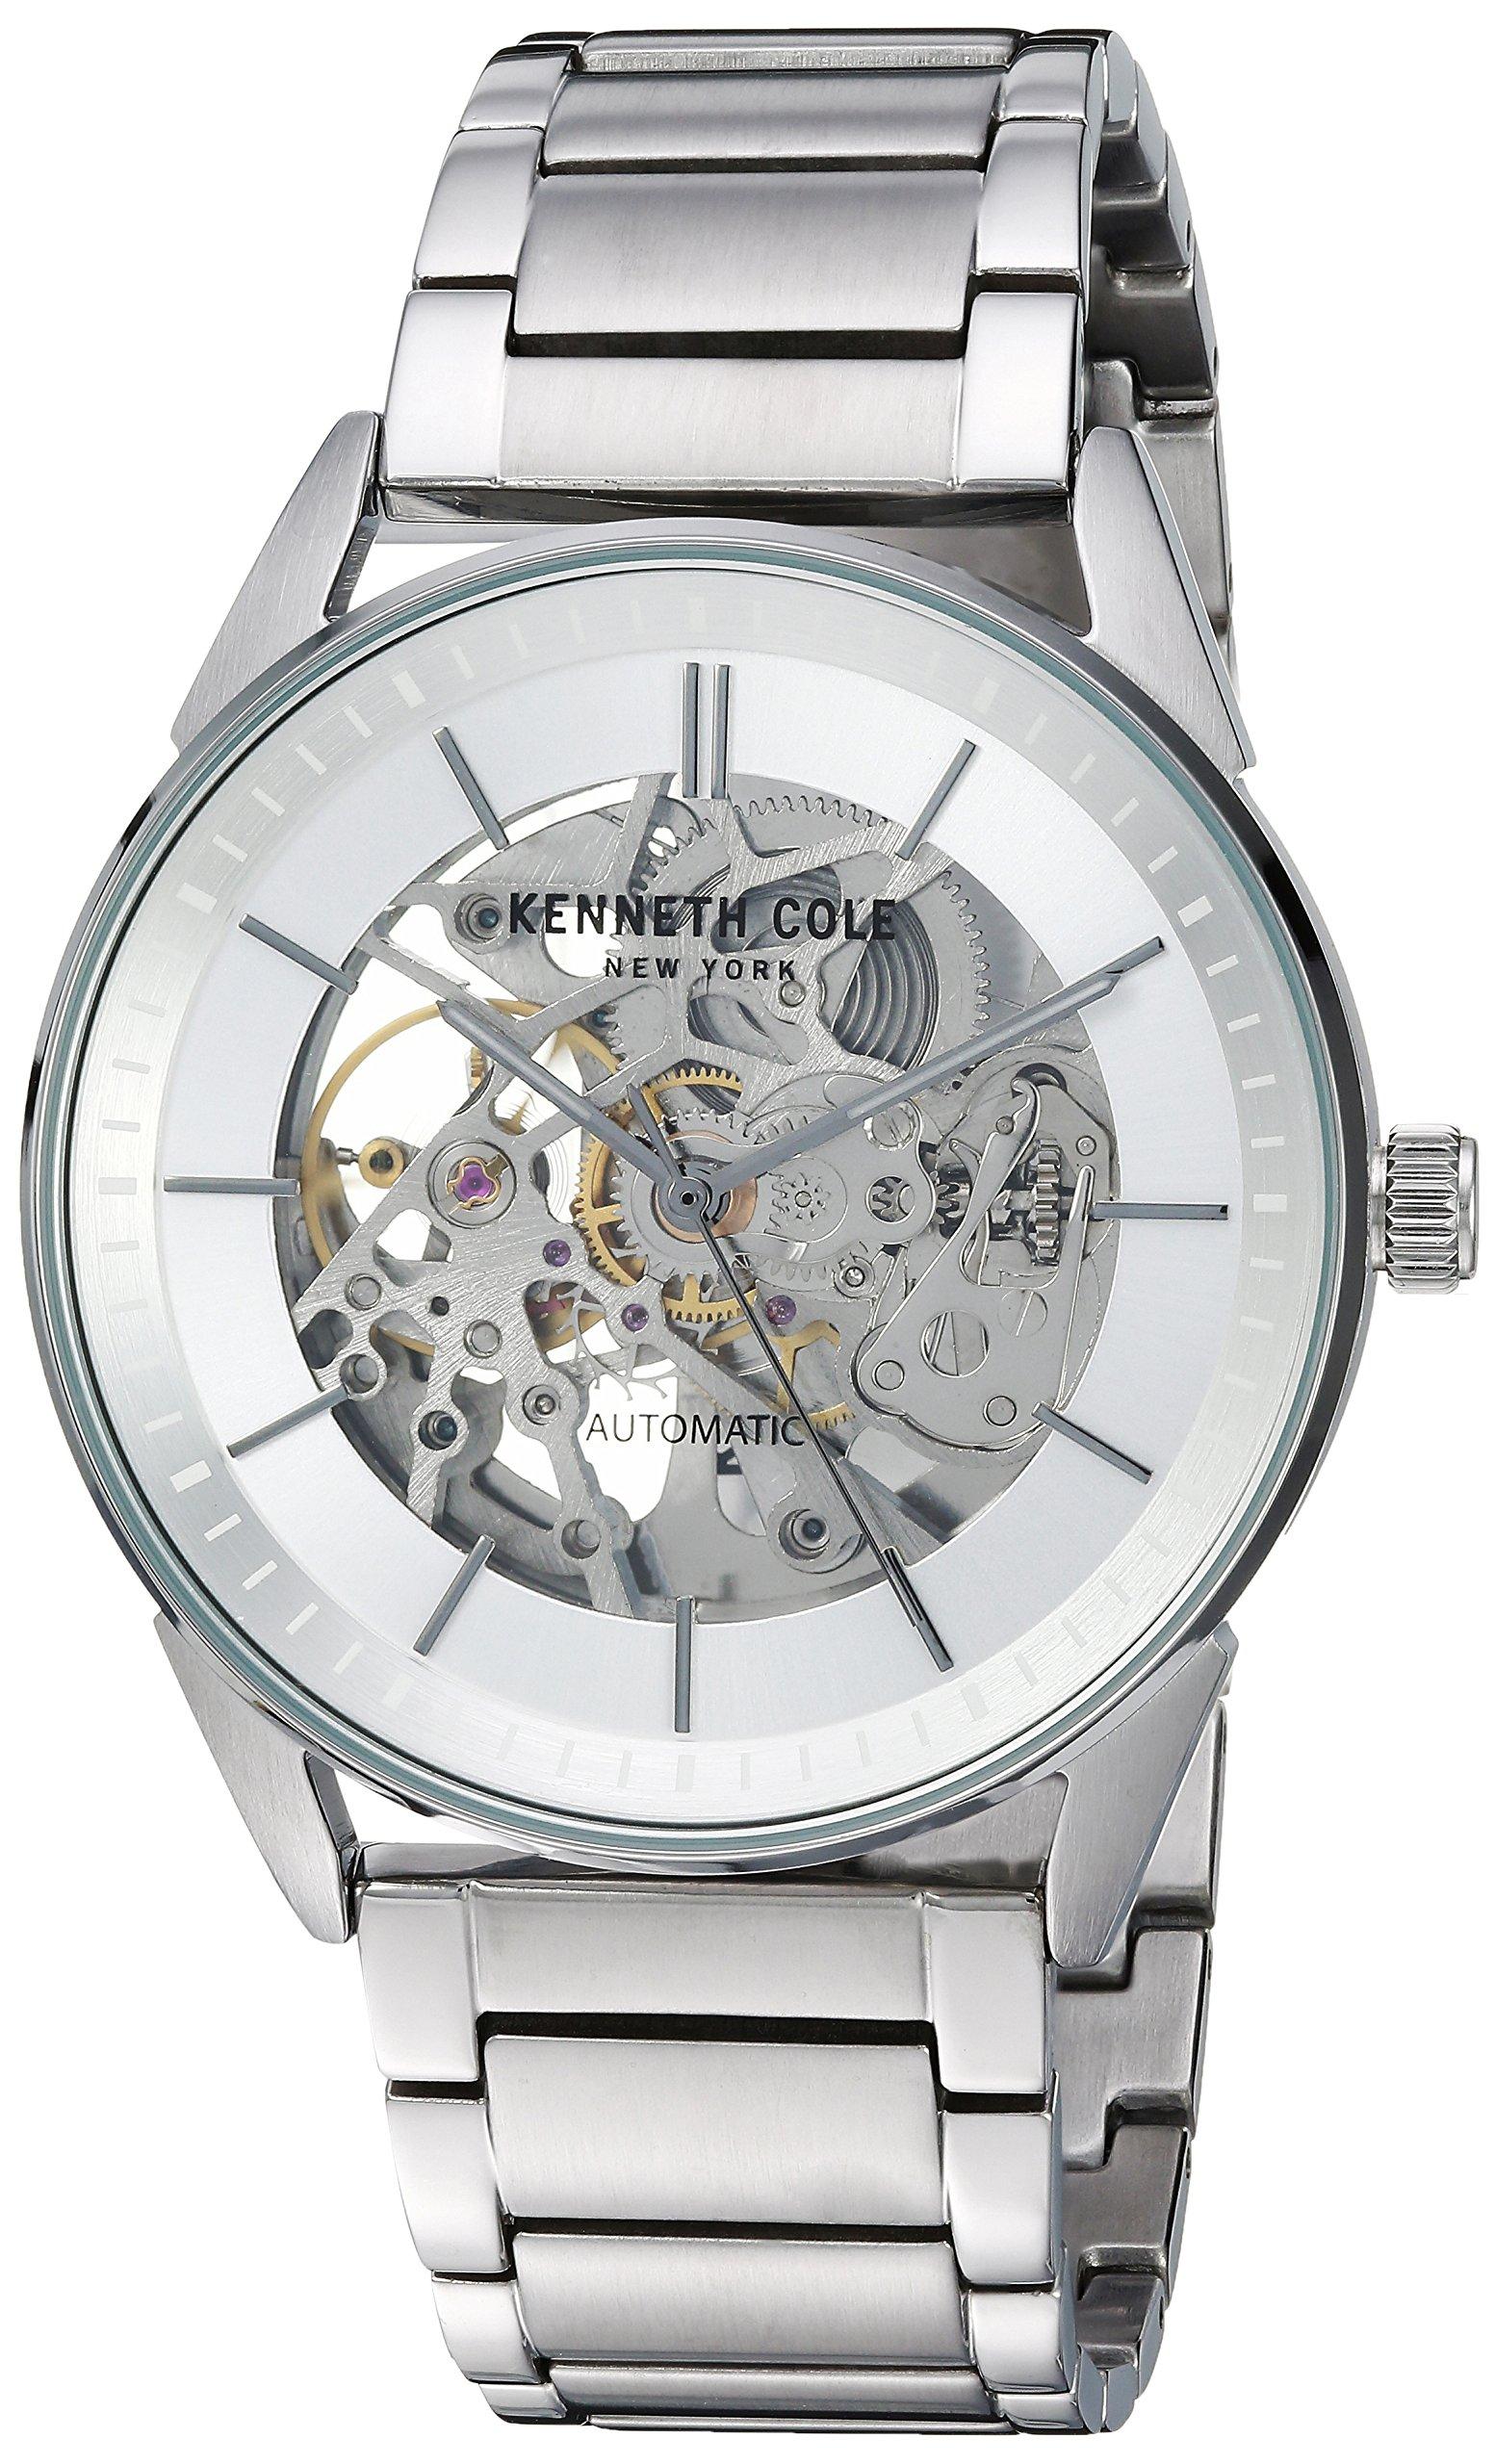 Kenneth Cole New York Male Quartz Watch by Kenneth Cole New York